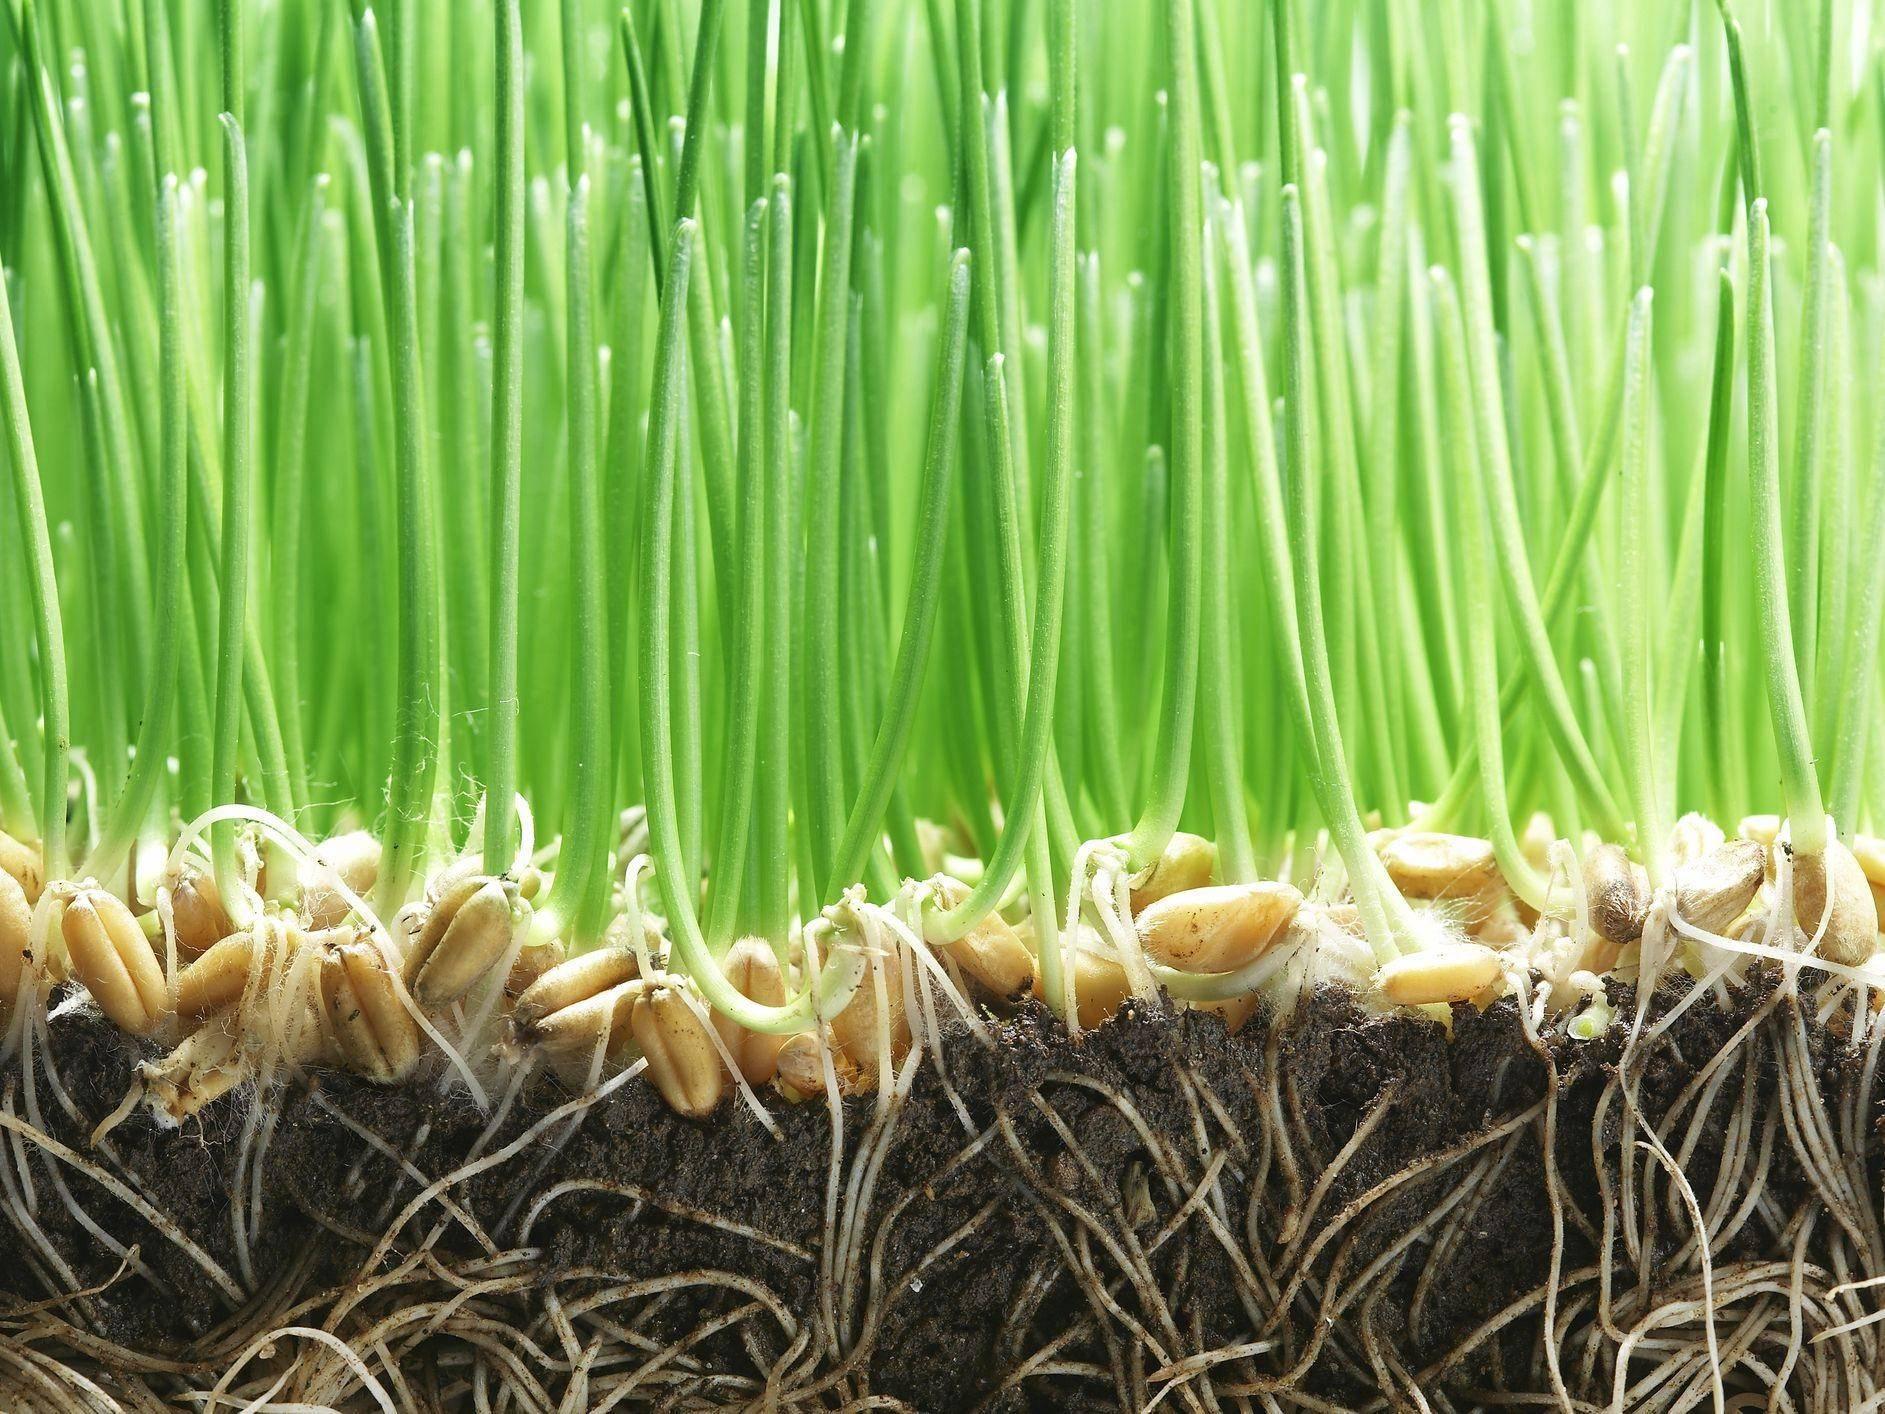 close up of growing grass